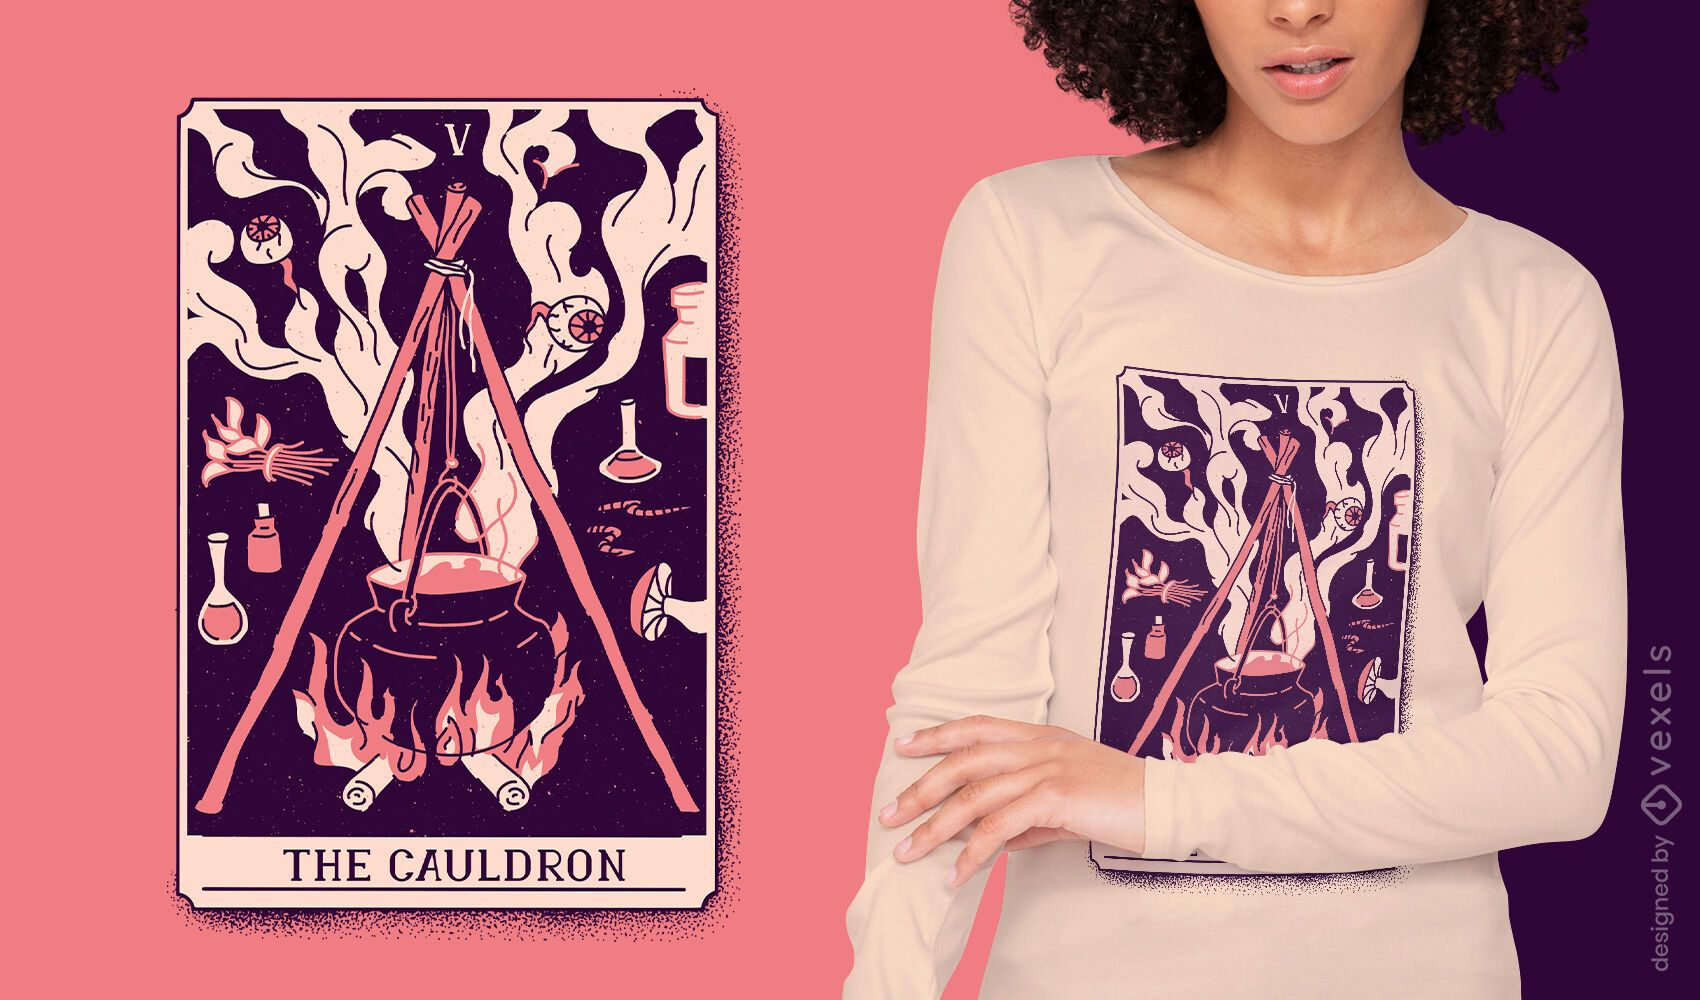 Diseño de camiseta de carta de tarot de caldero.